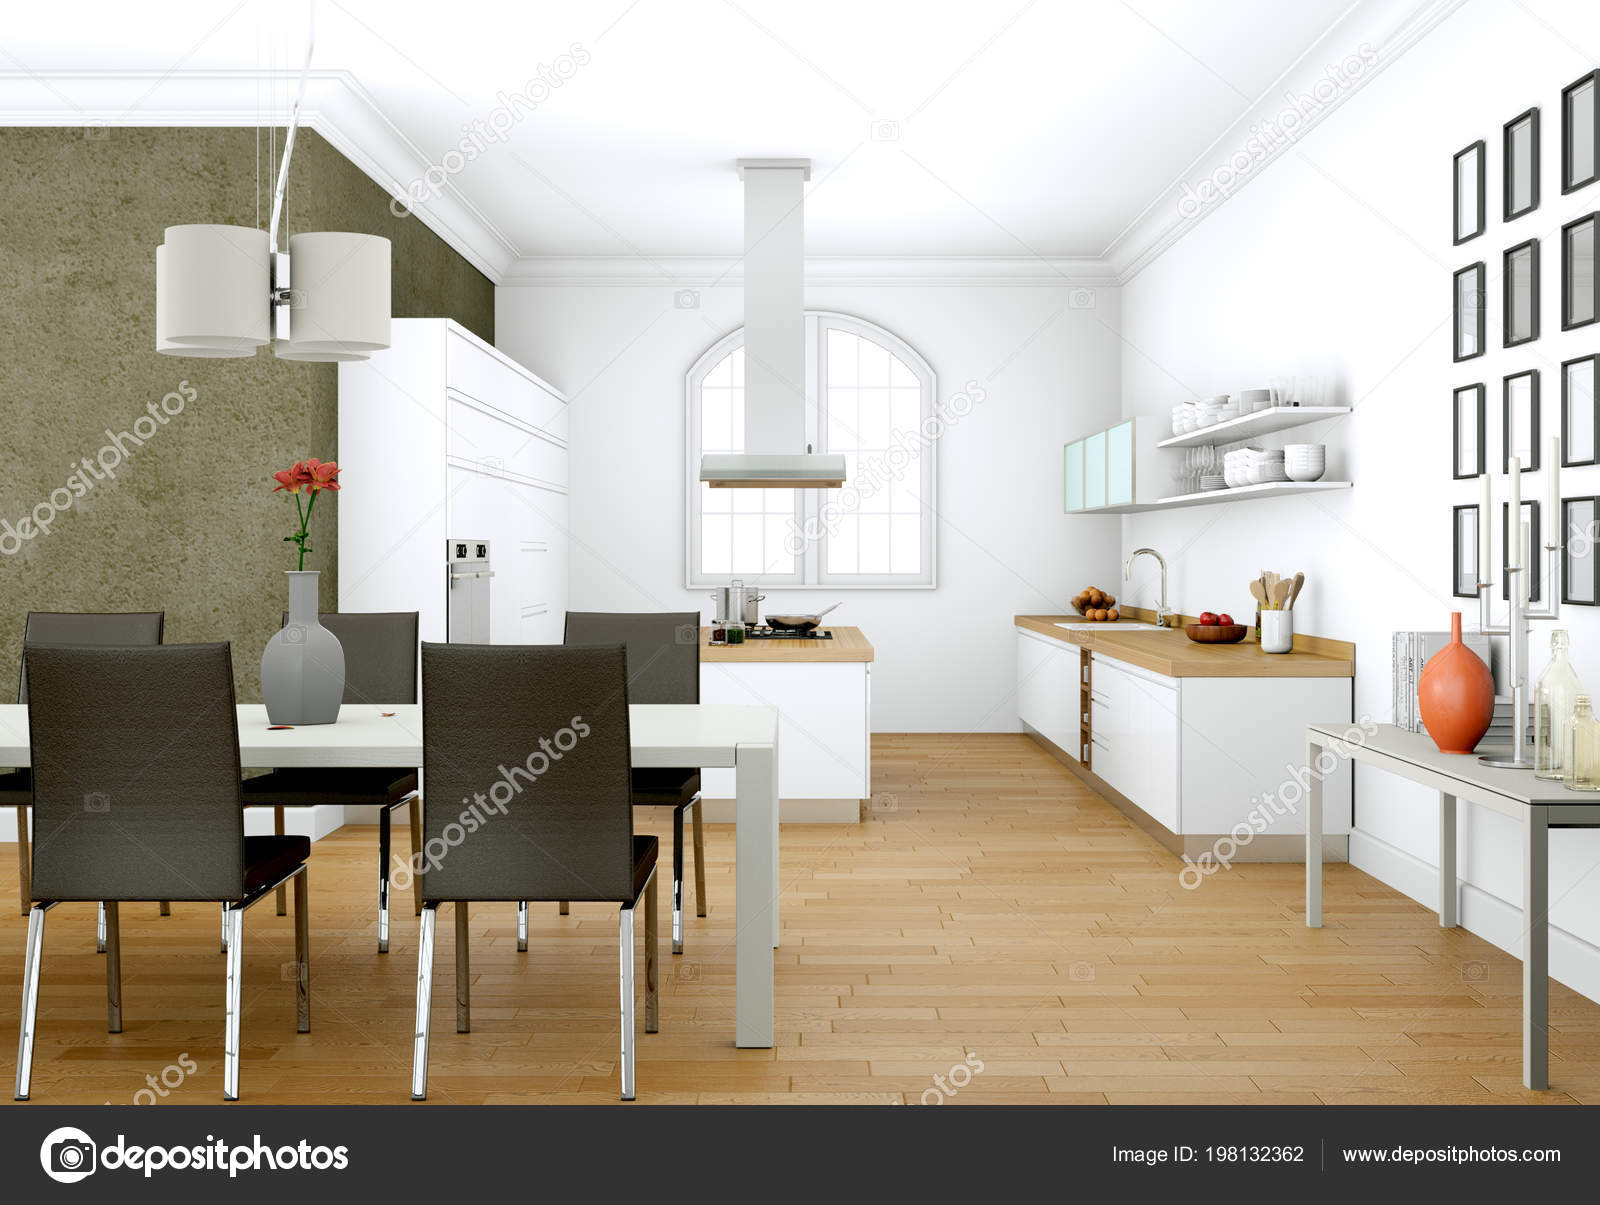 Superbe Salle à Manger Design Du0027intérieur En Appartement Moderne Illustration 3d U2014  Image De Virtua73